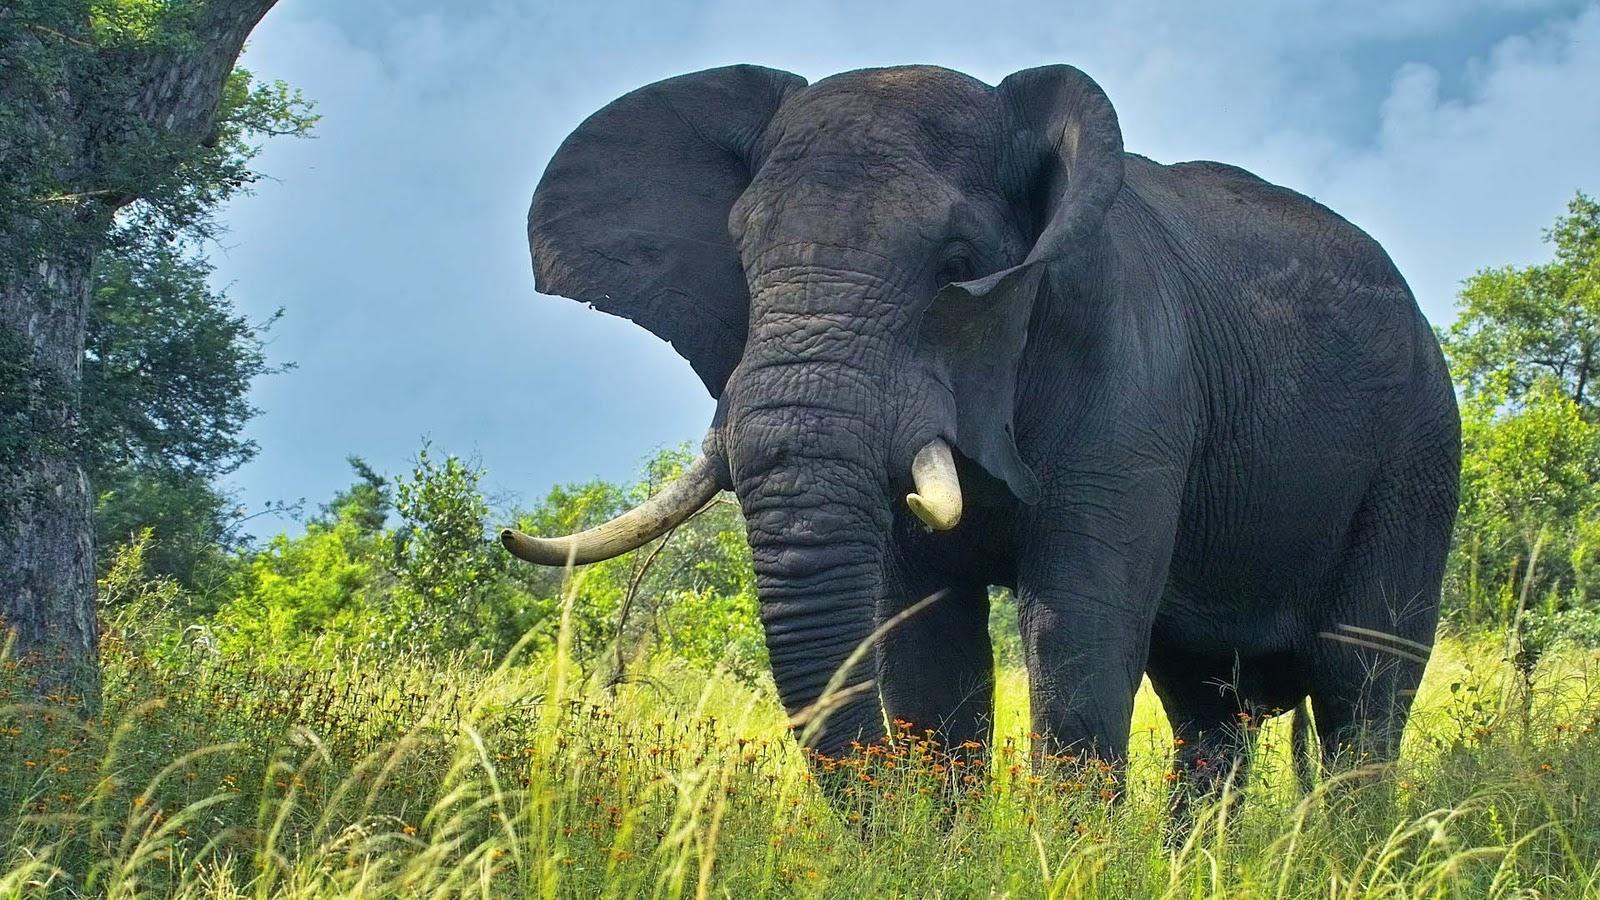 elephants wallpapers world - photo #9